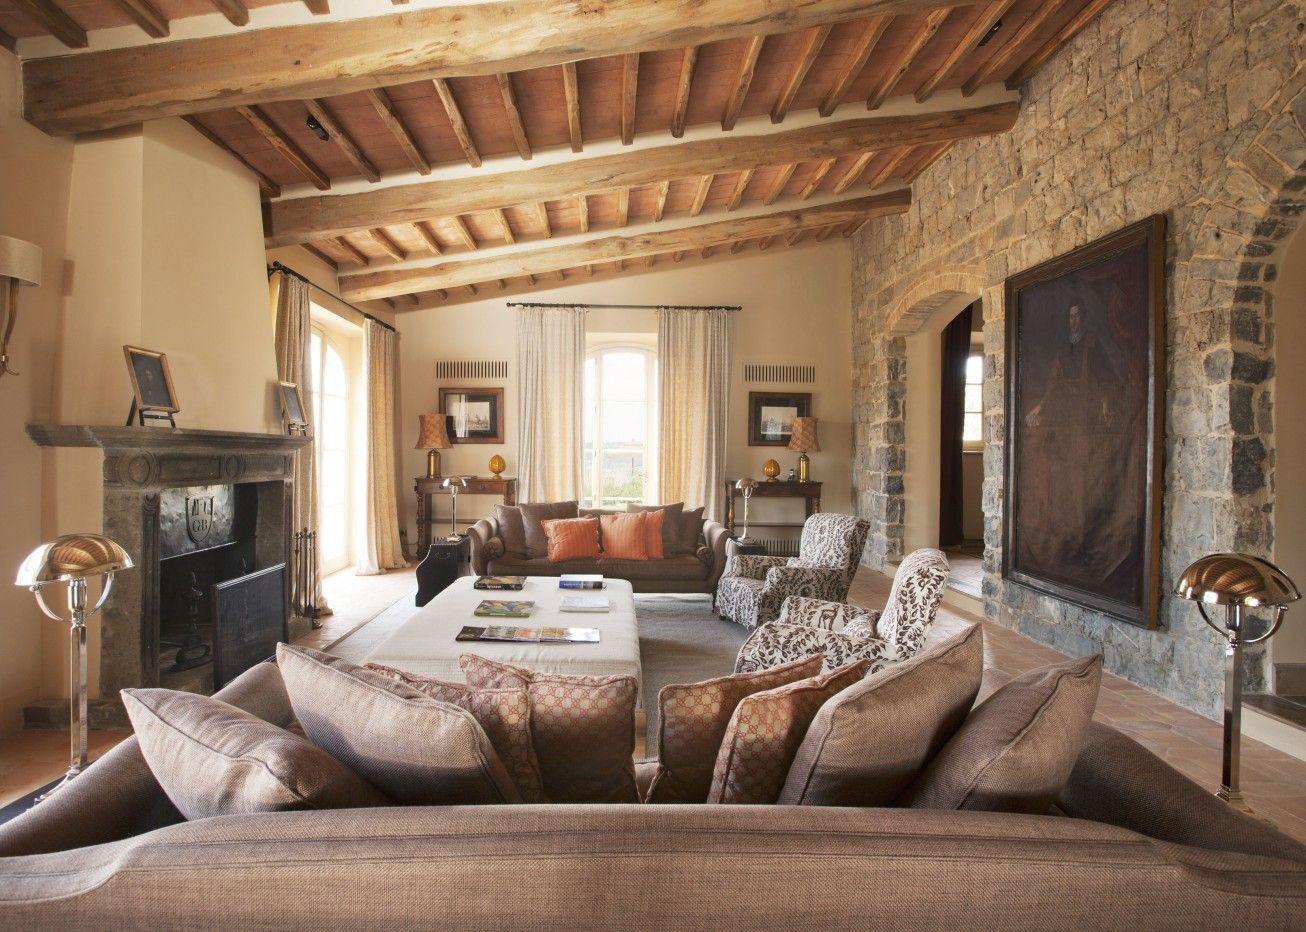 Classy Tuscan Living Room Furniture Ec Spacious Design